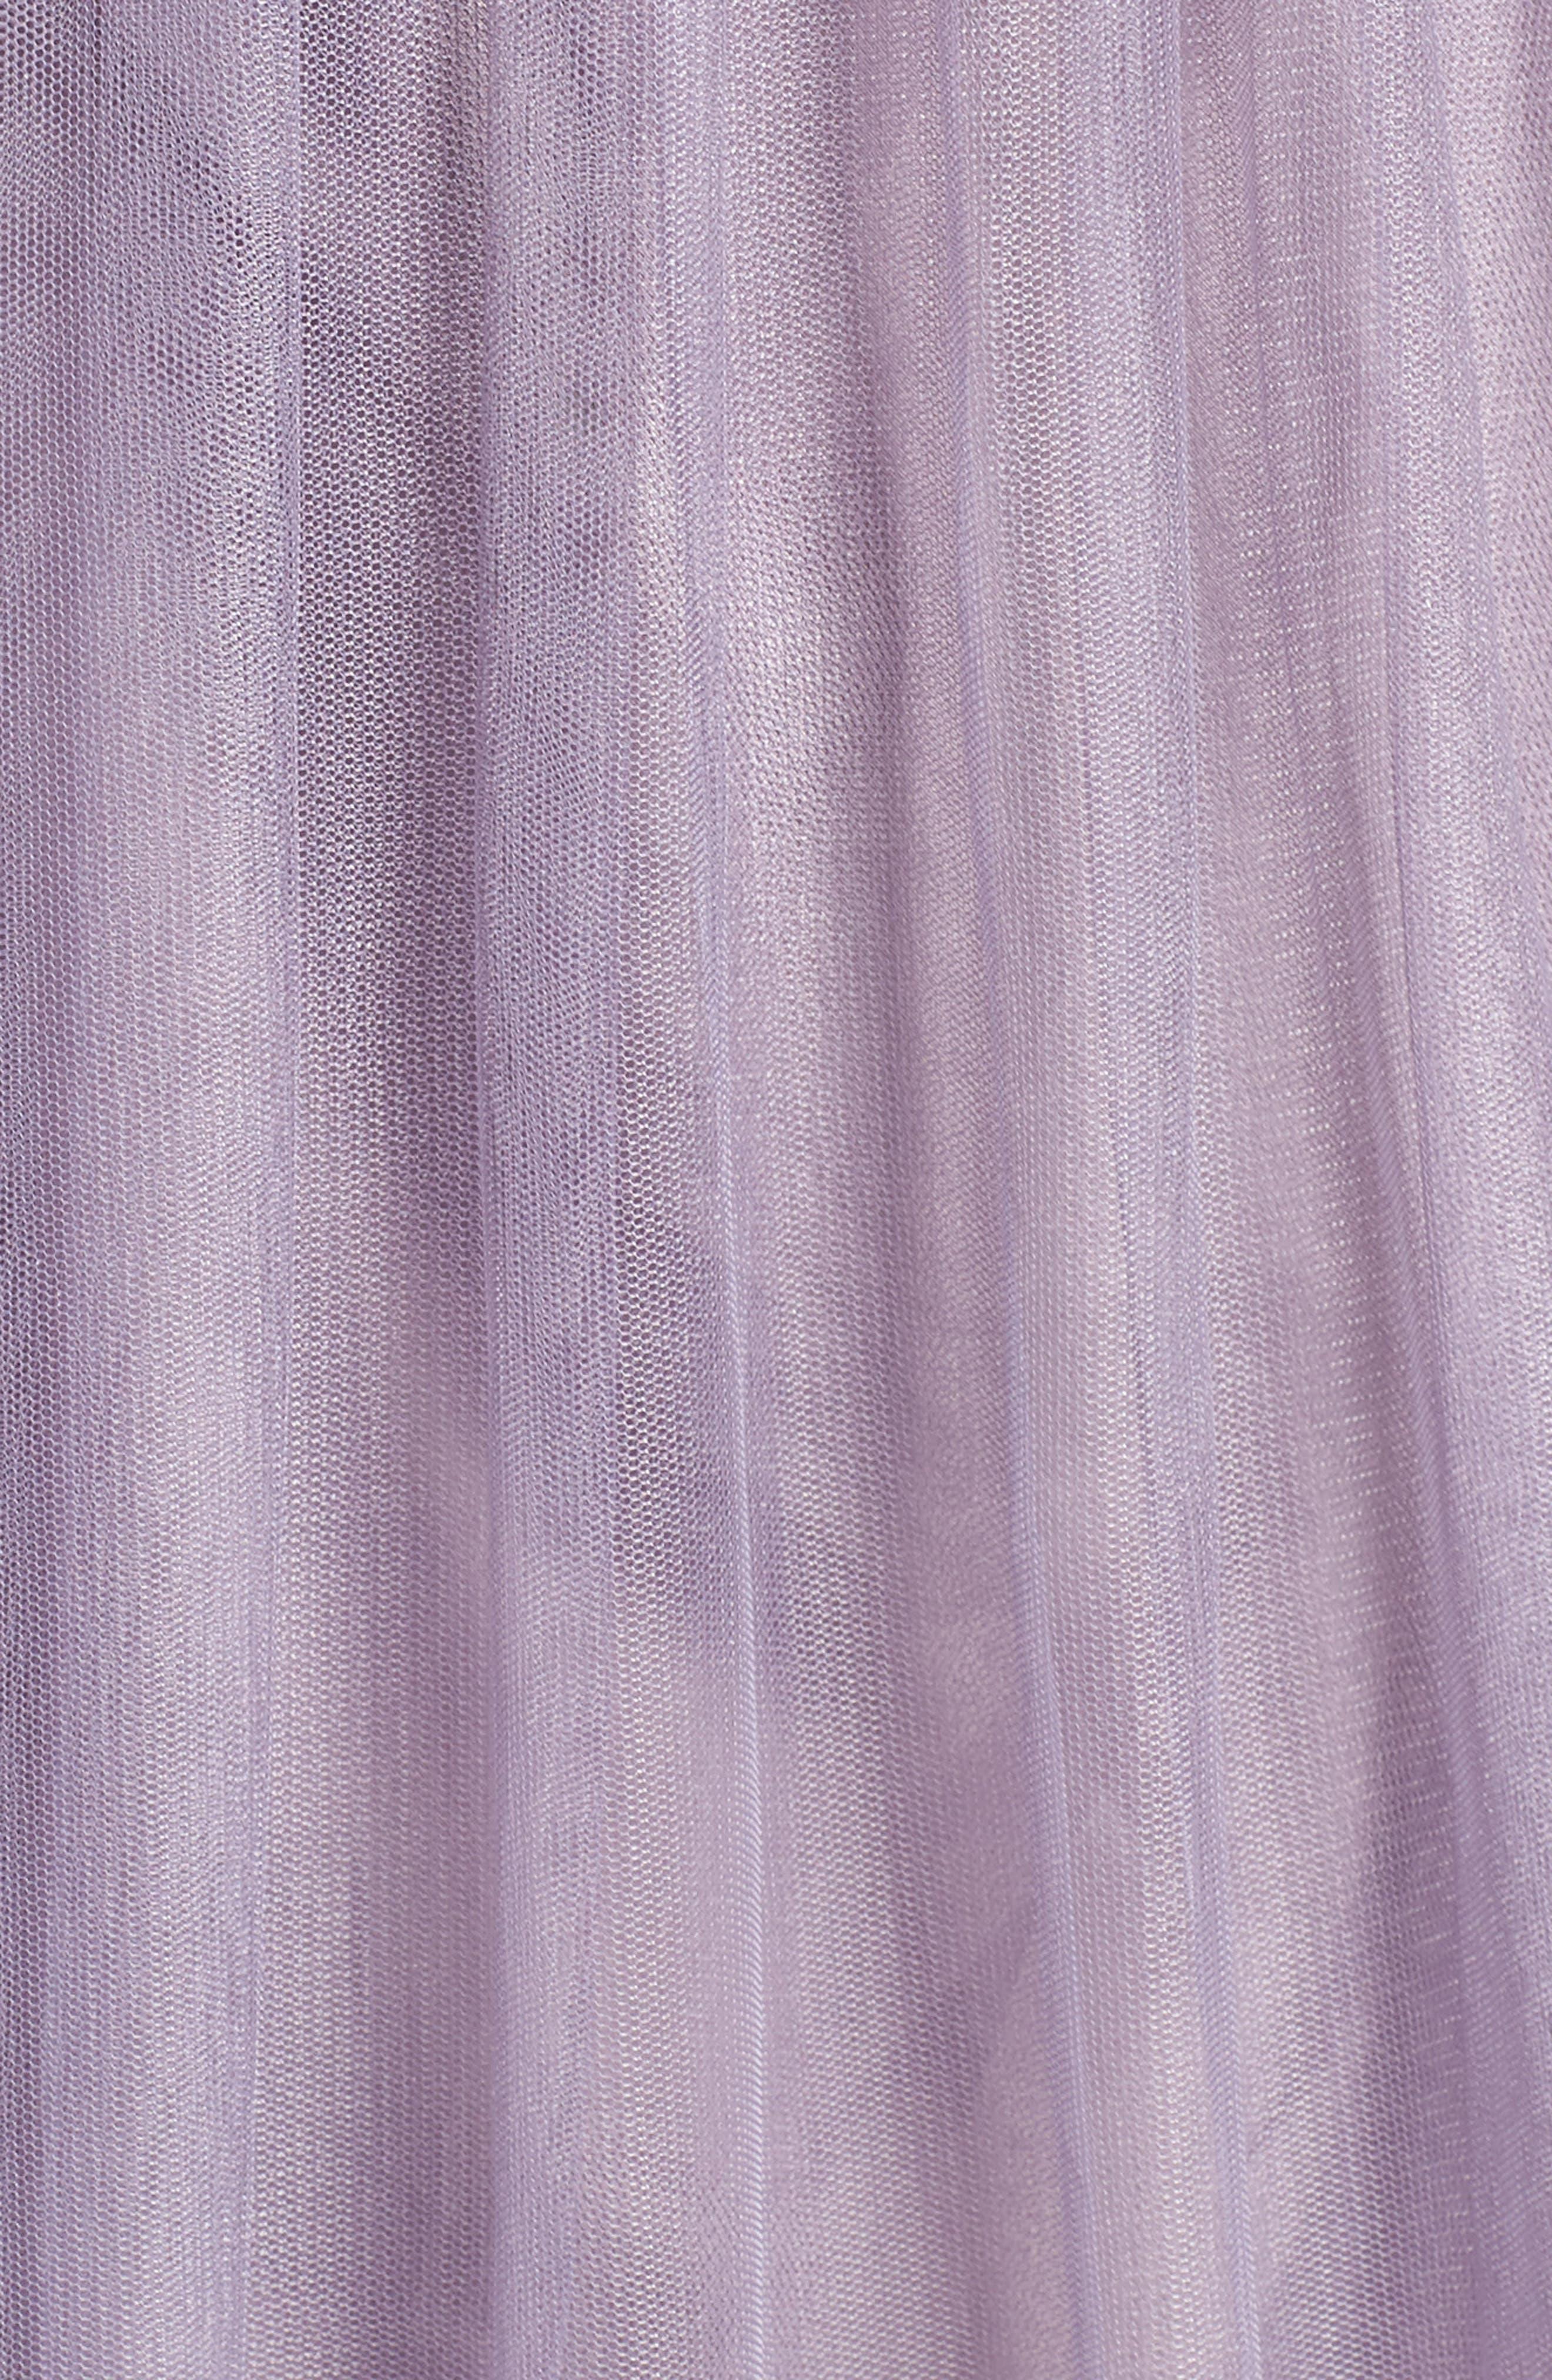 Illusion Gown,                             Alternate thumbnail 14, color,